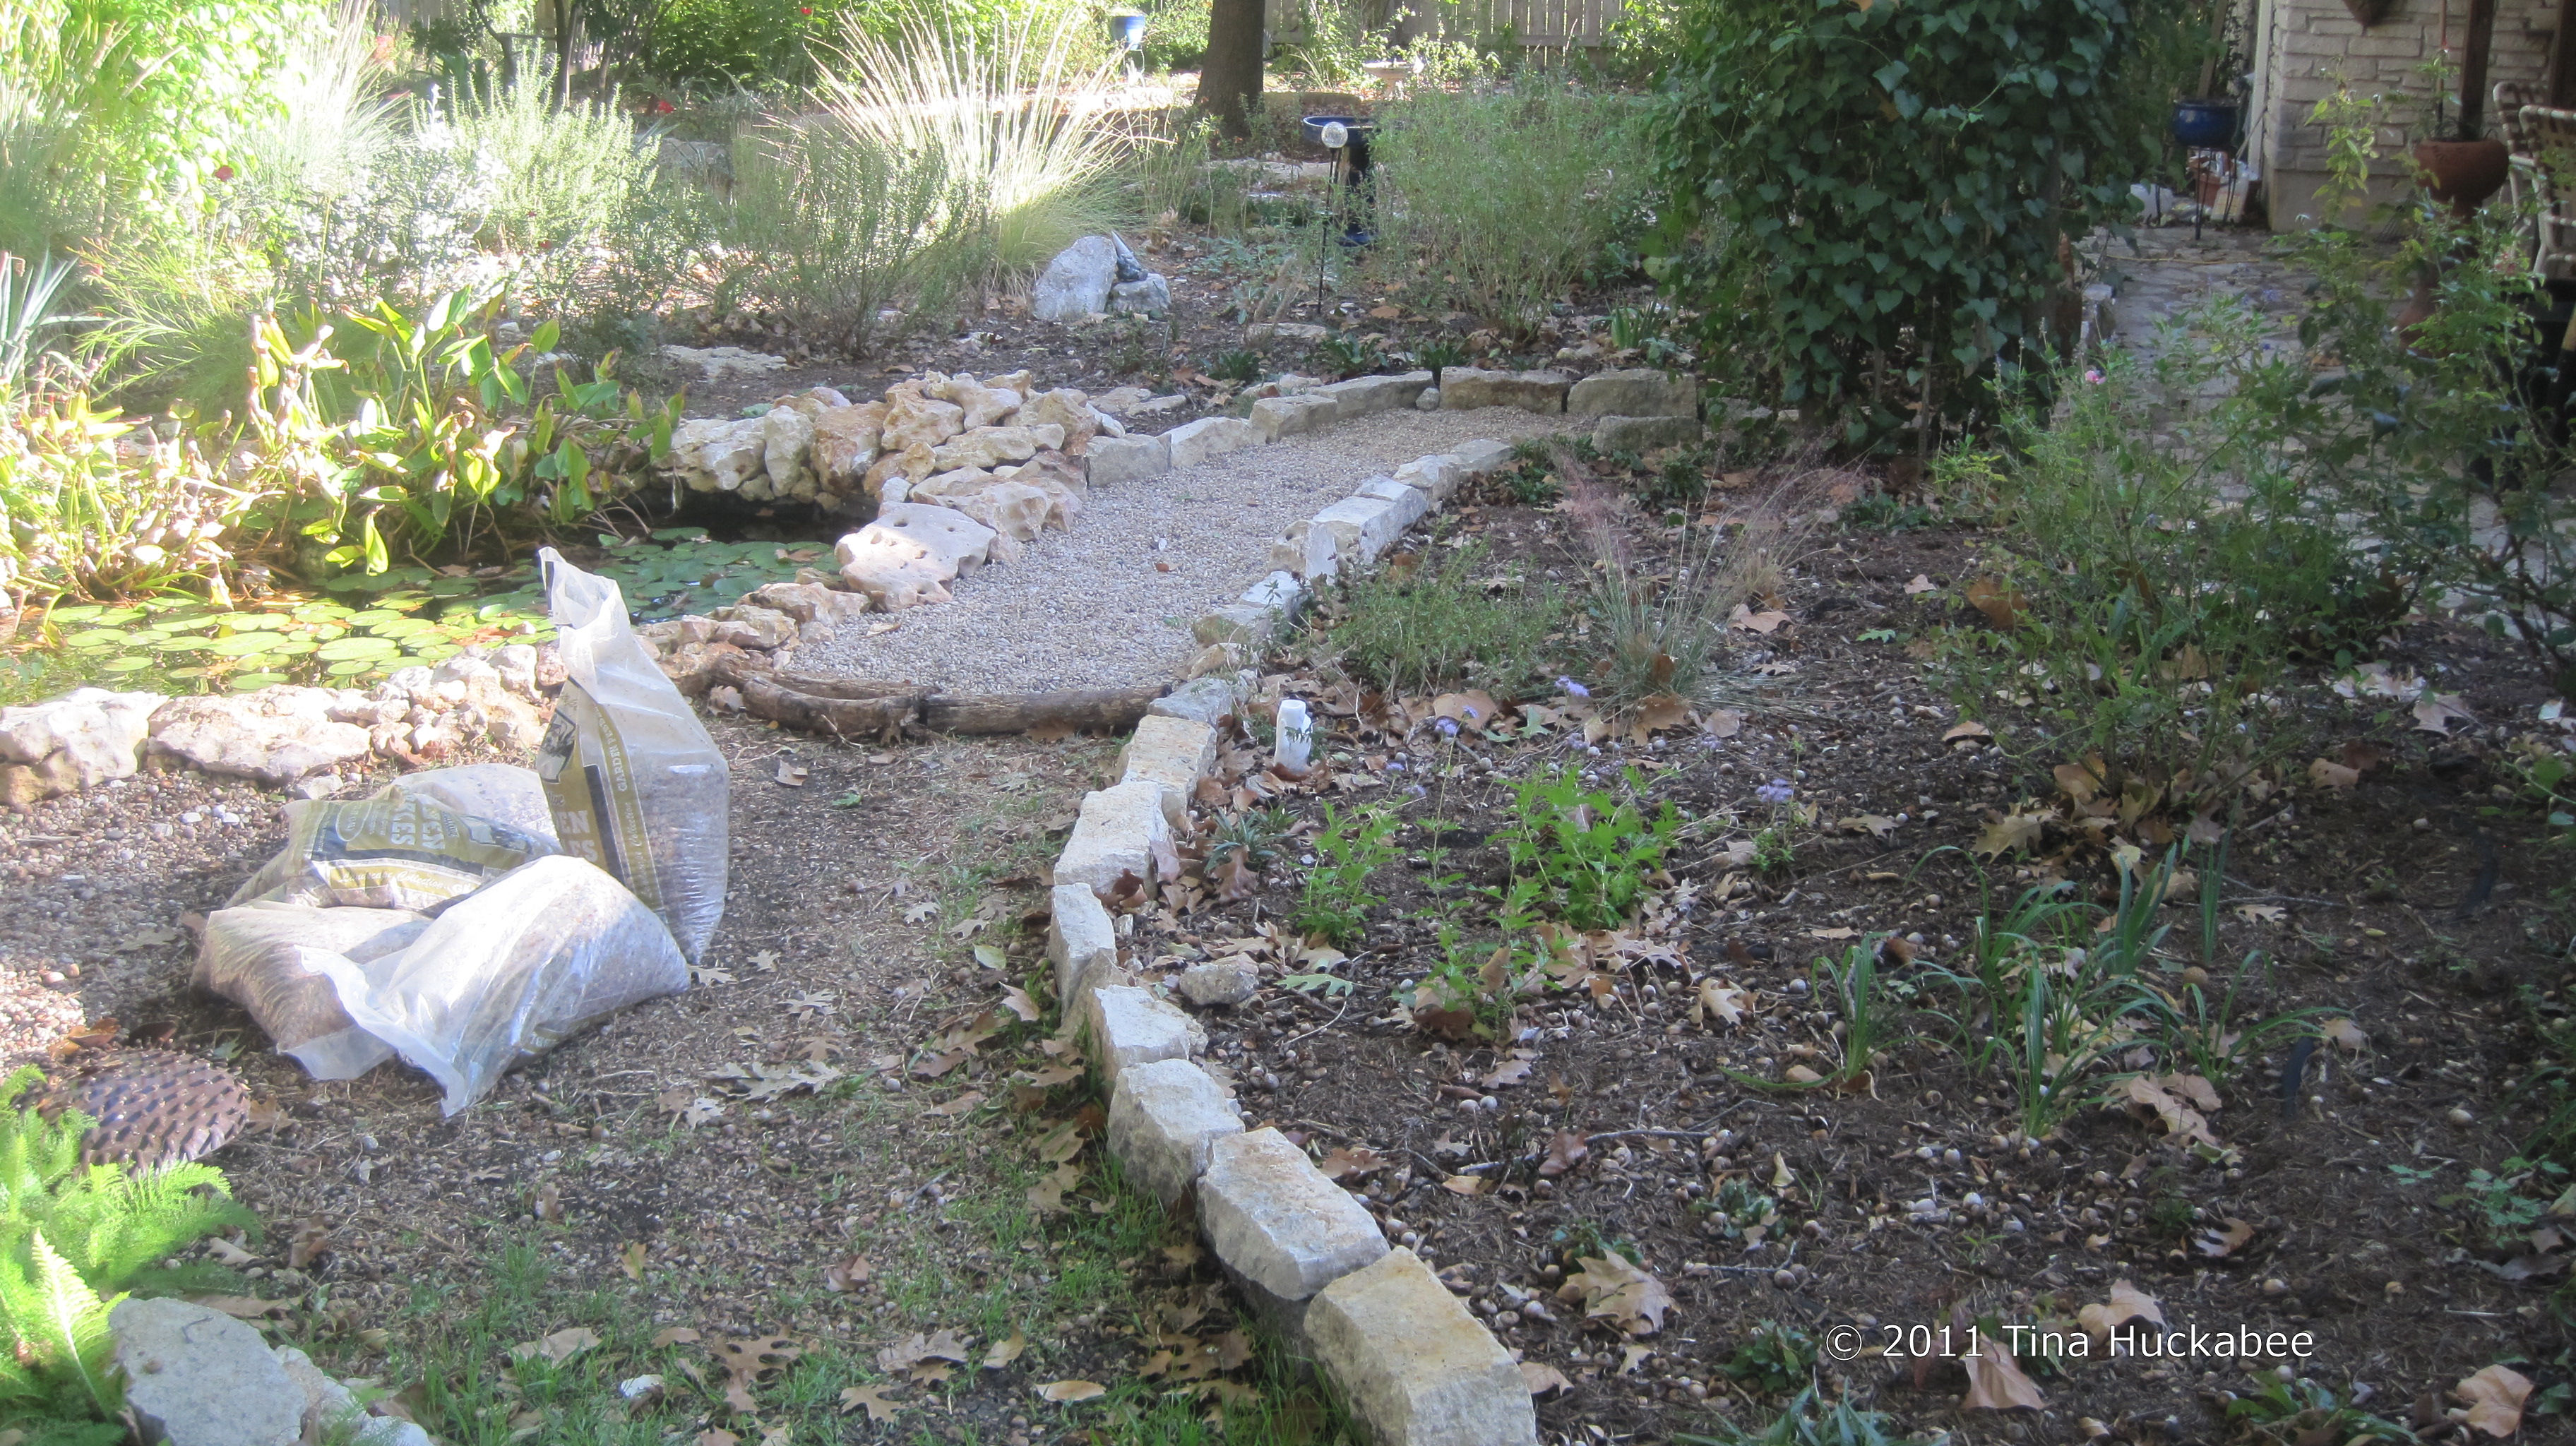 Pea Gravel My Gardener Says